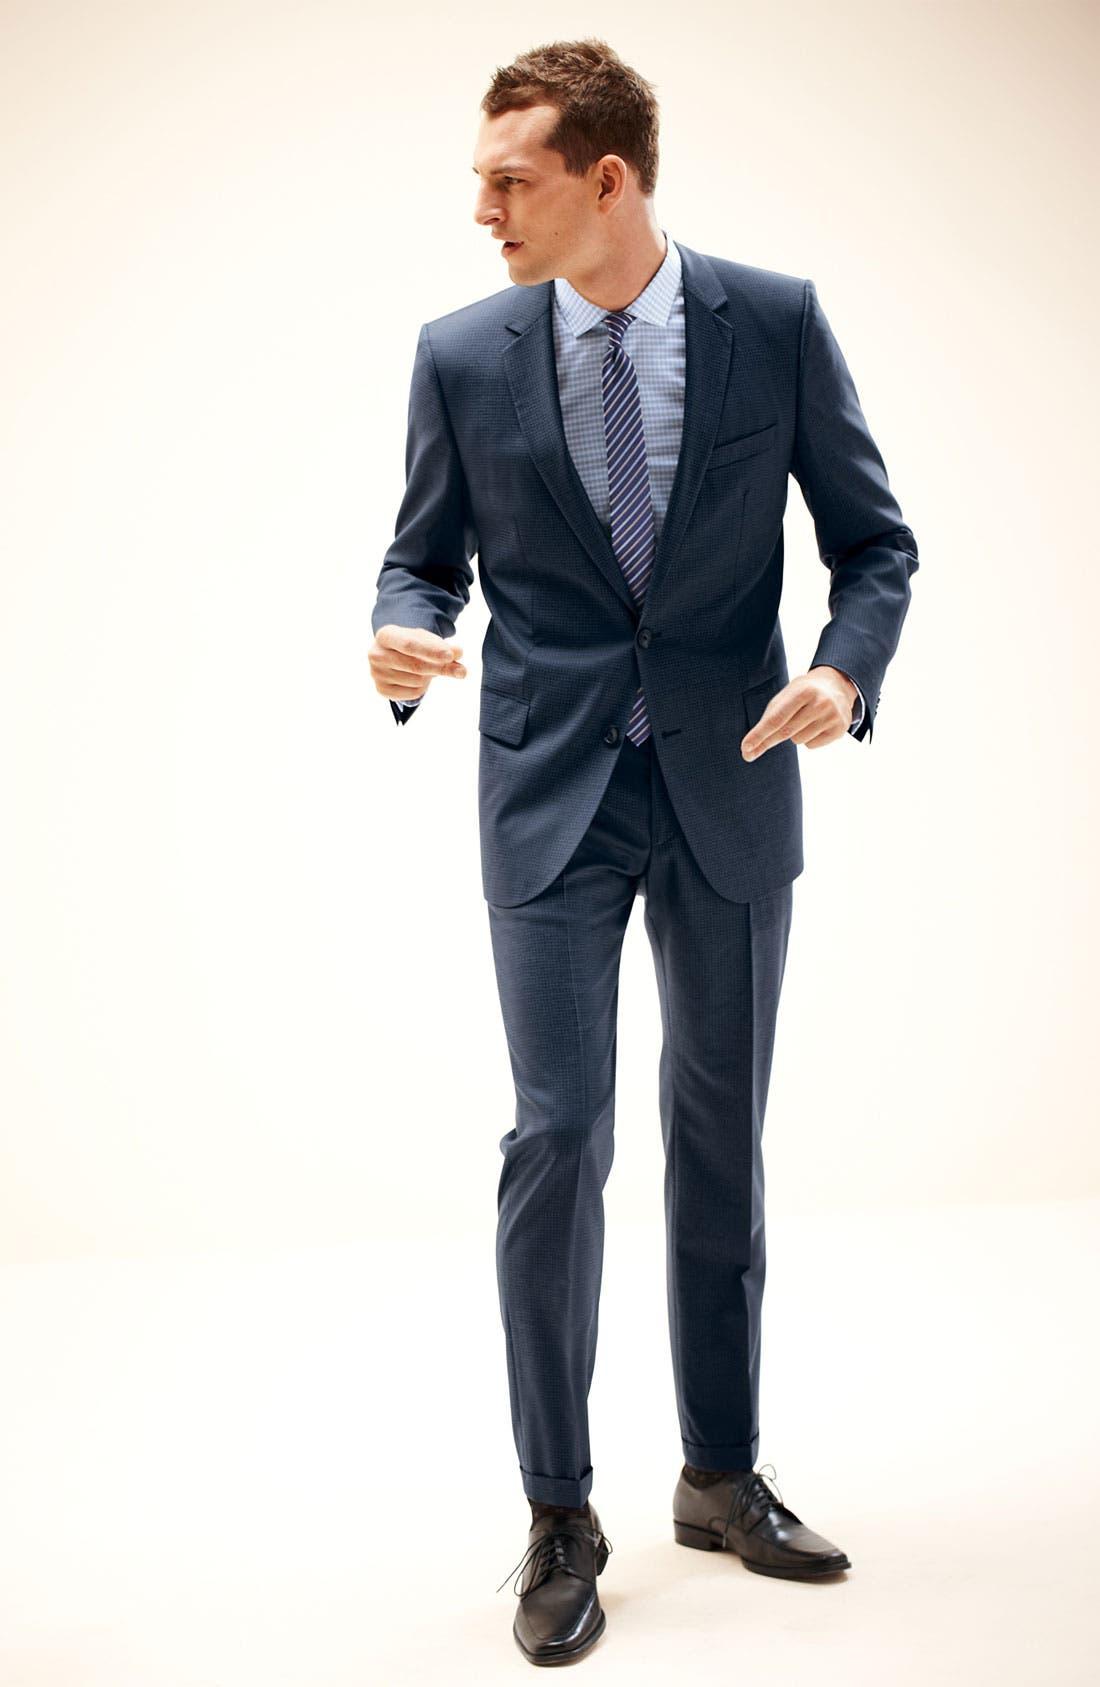 Alternate Image 1 Selected - HUGO Suit & Dress Shirt